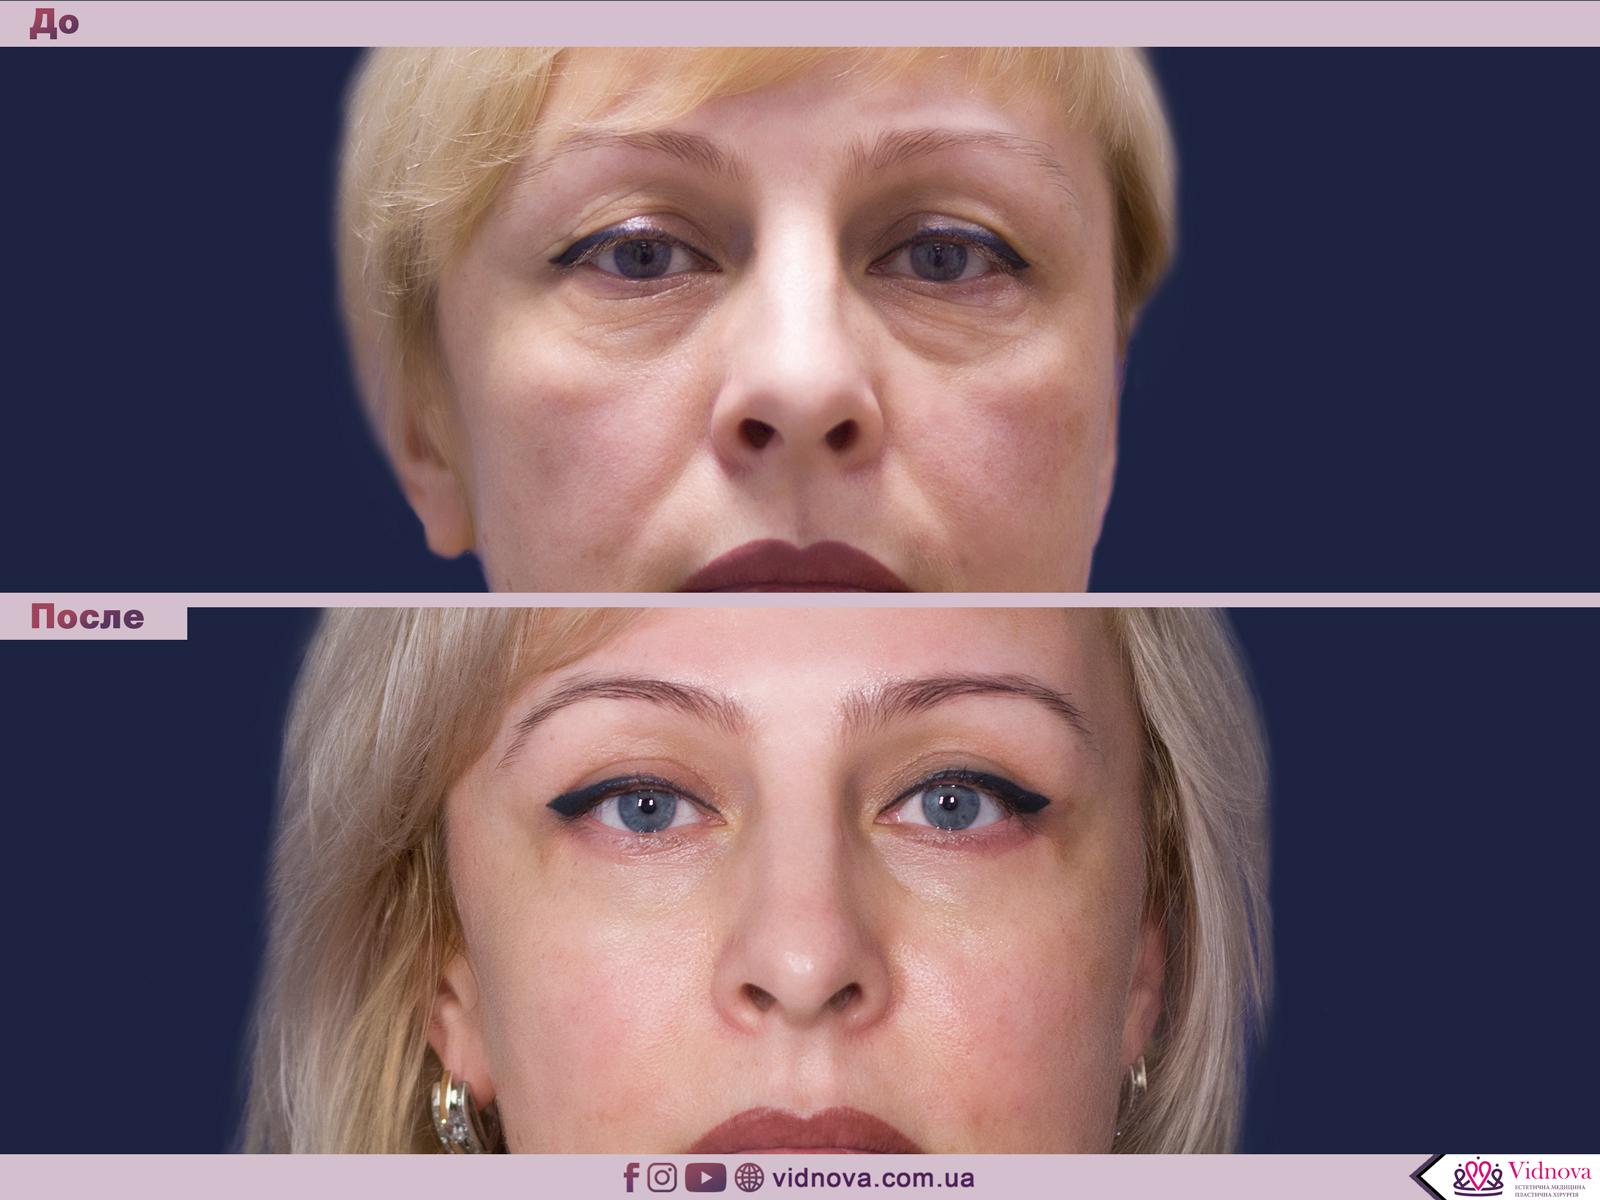 Блефаропластика: Фото До и После - Пример №51-1 - Клиника Vidnova